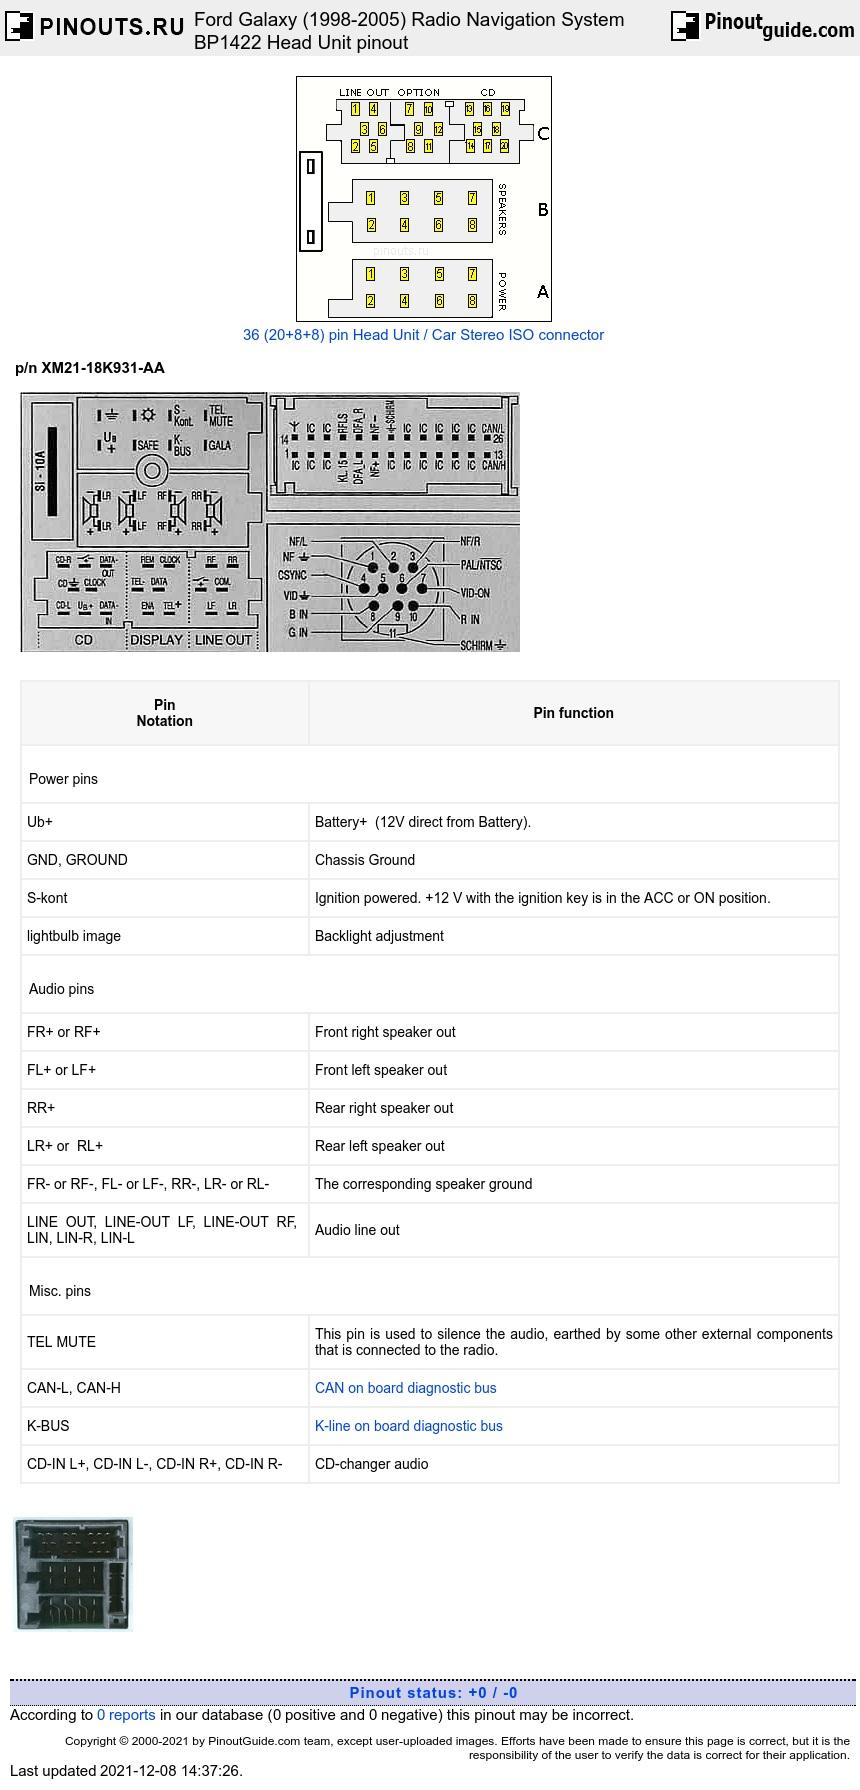 hight resolution of ford radio navigation system bp1422 diagram